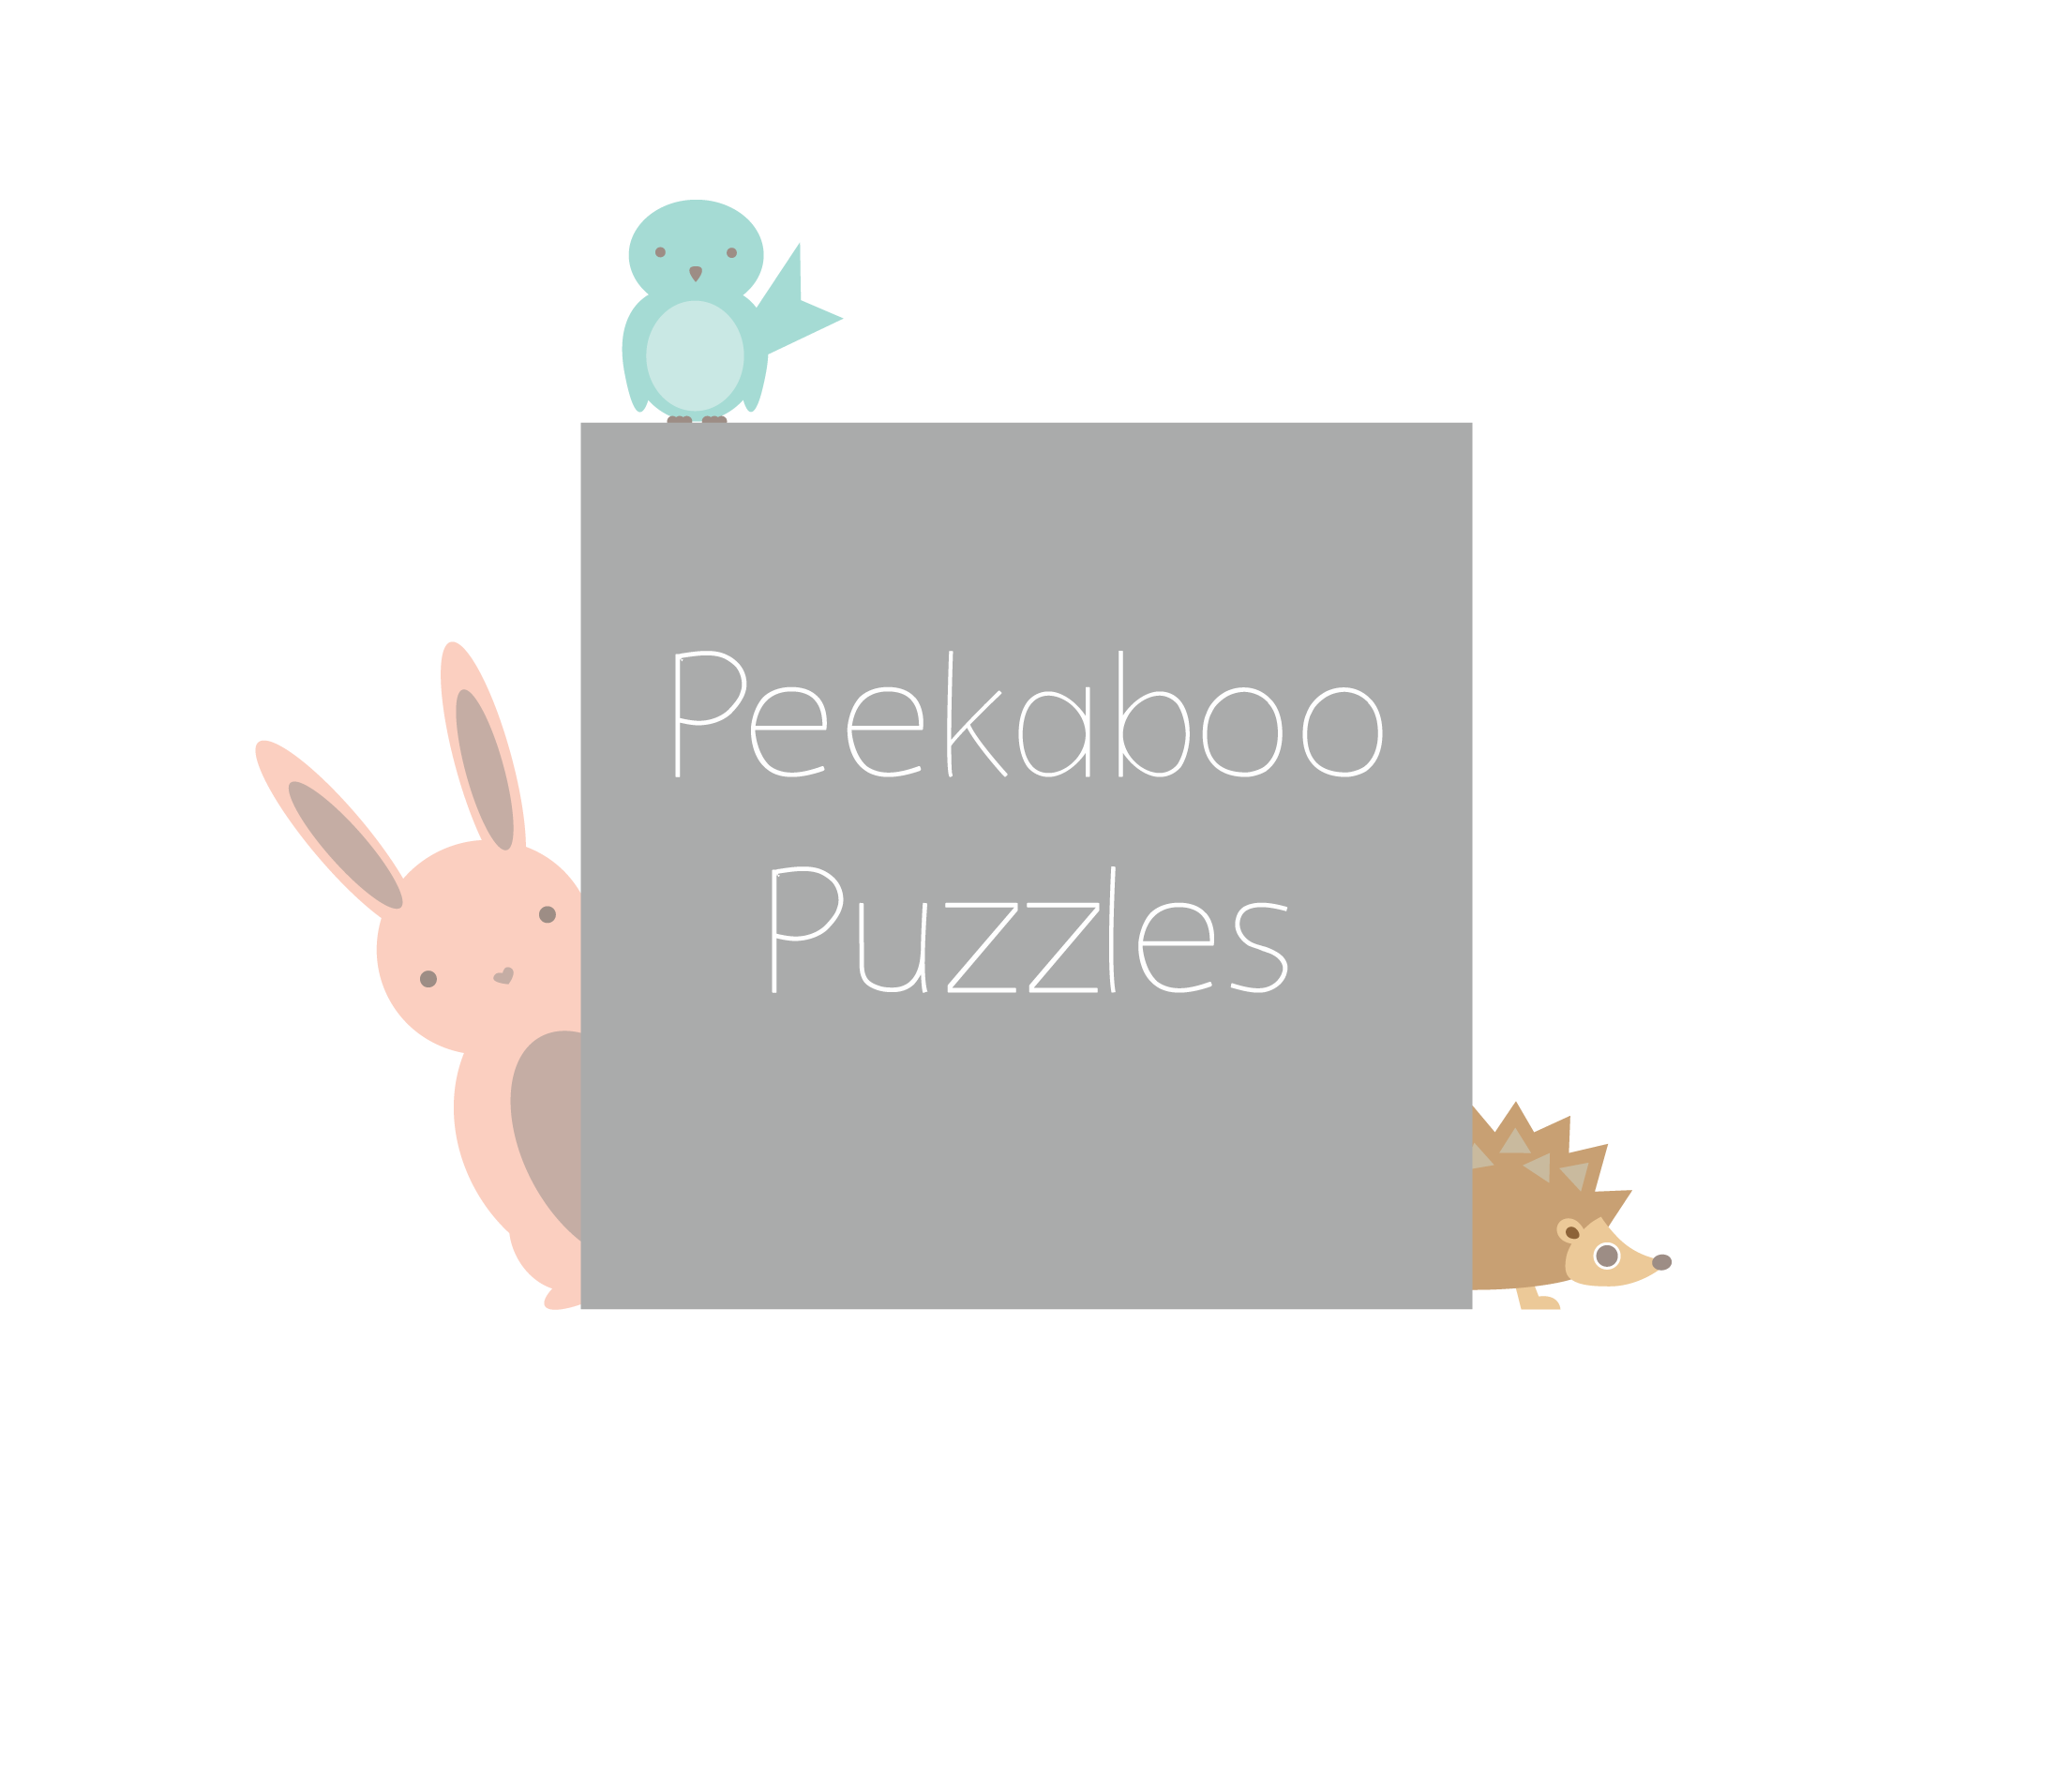 Peekaboo Puzzle